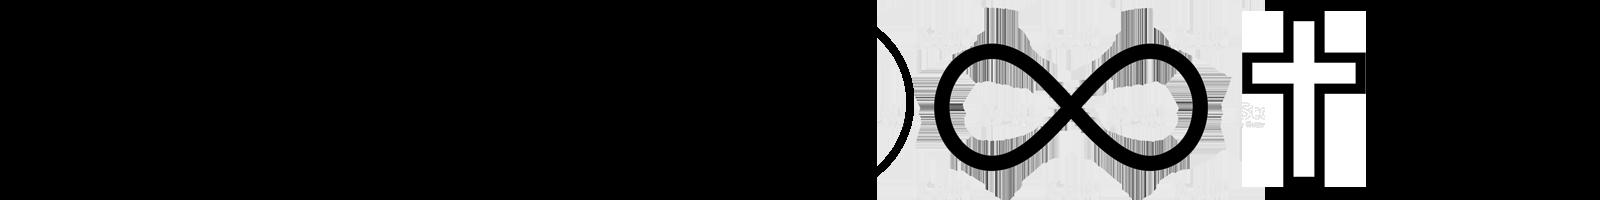 gravur-symbole